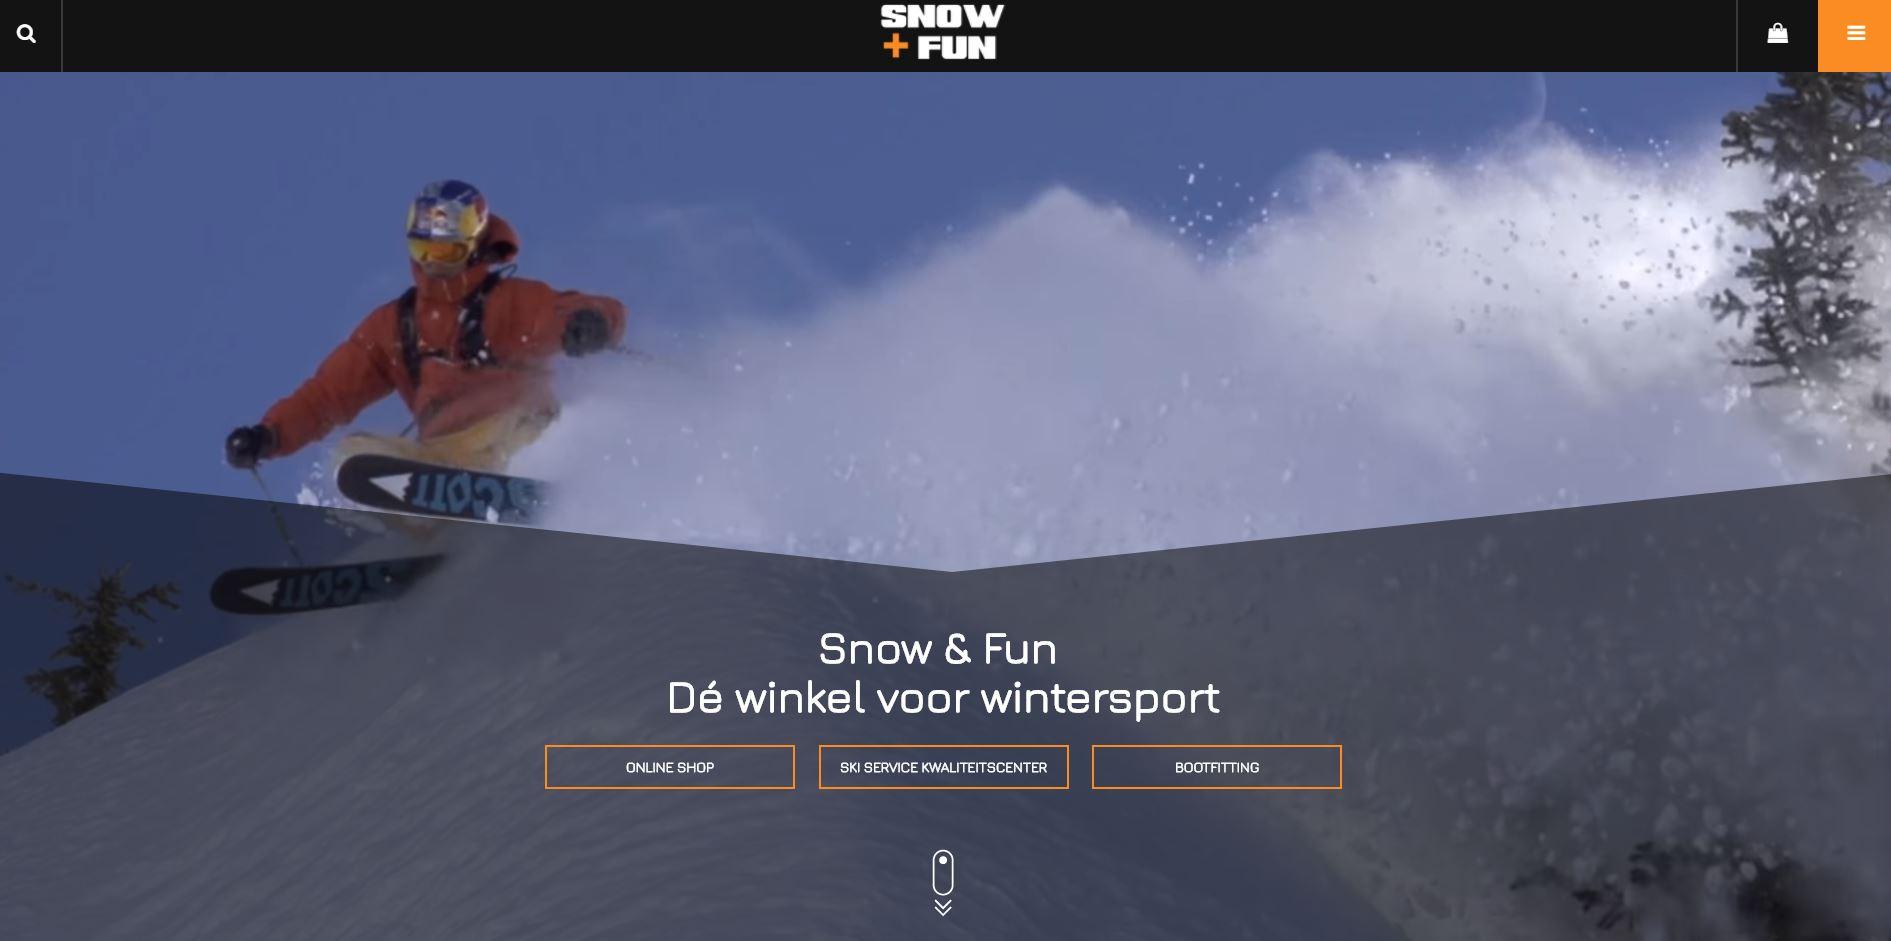 snow & fun webshop ski materiaal